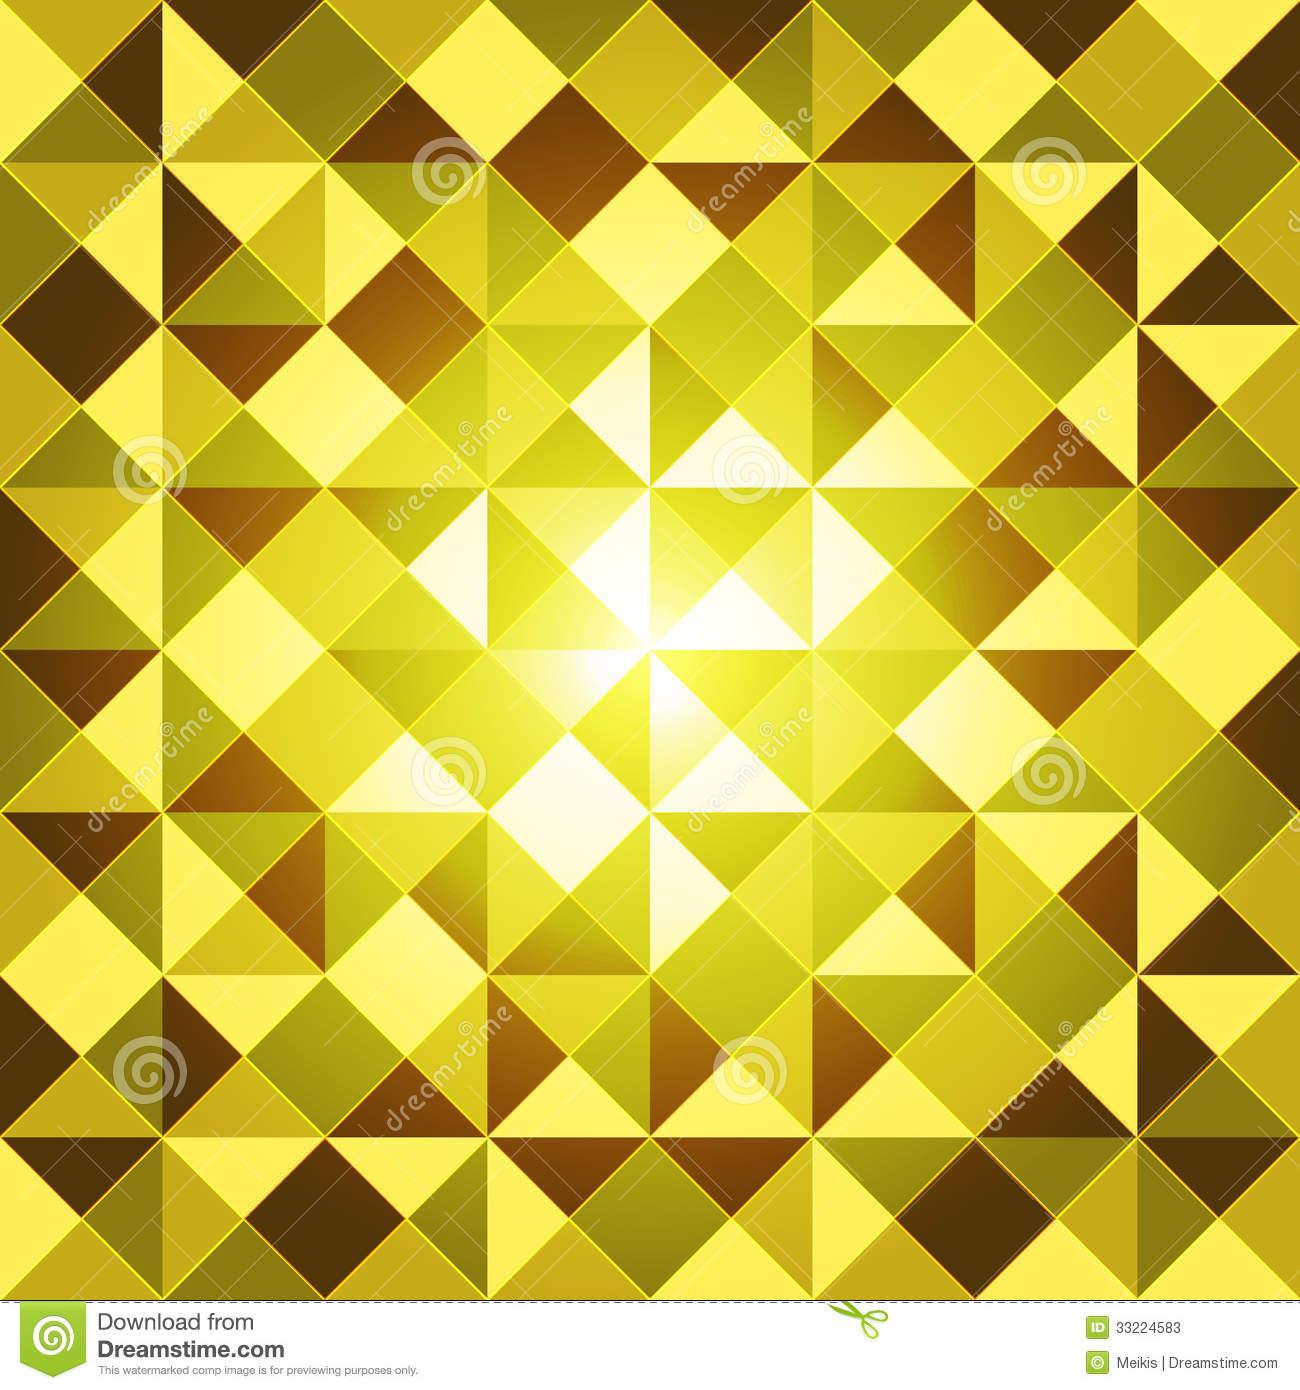 wallpaper modern geometric   wwwhigh definition wallpapercom 1300x1390